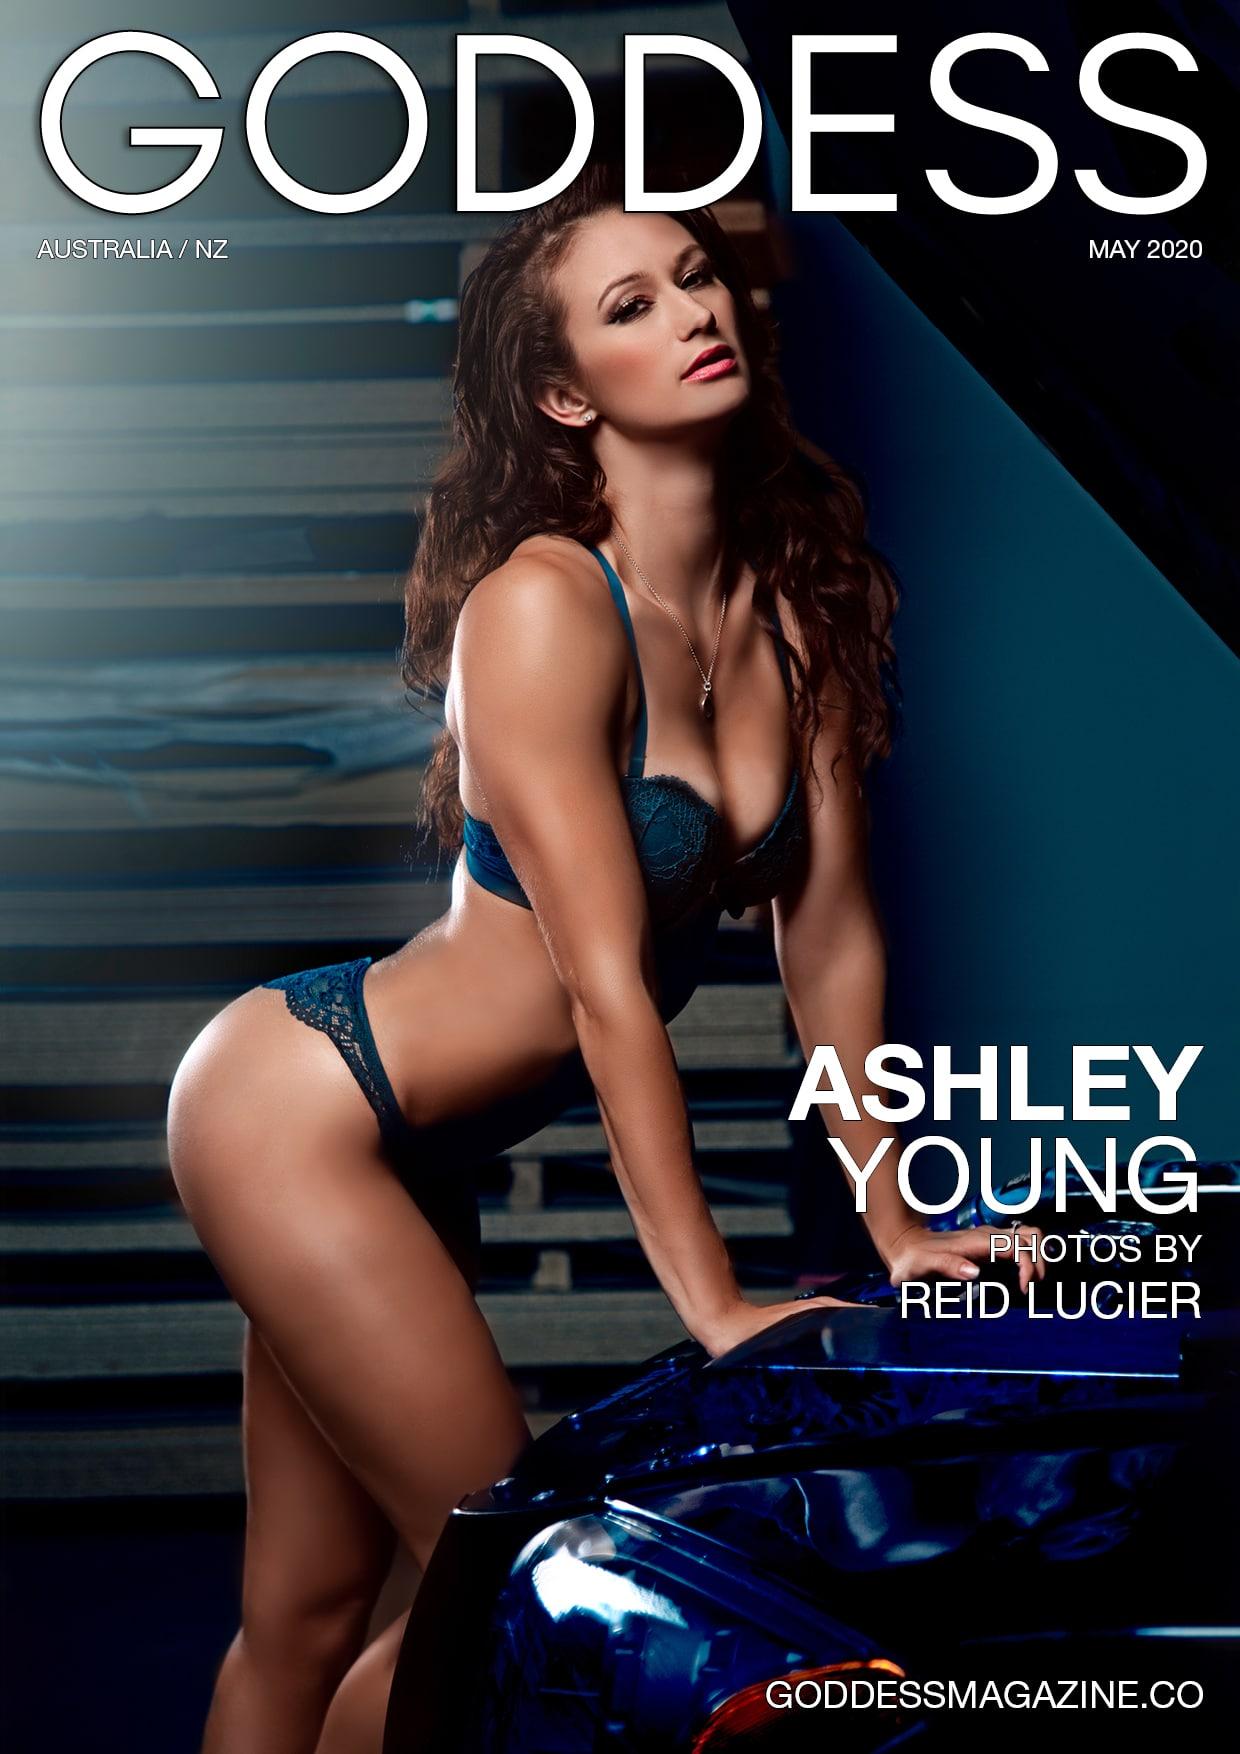 Goddess Magazine - May 2020 - Ashley Young